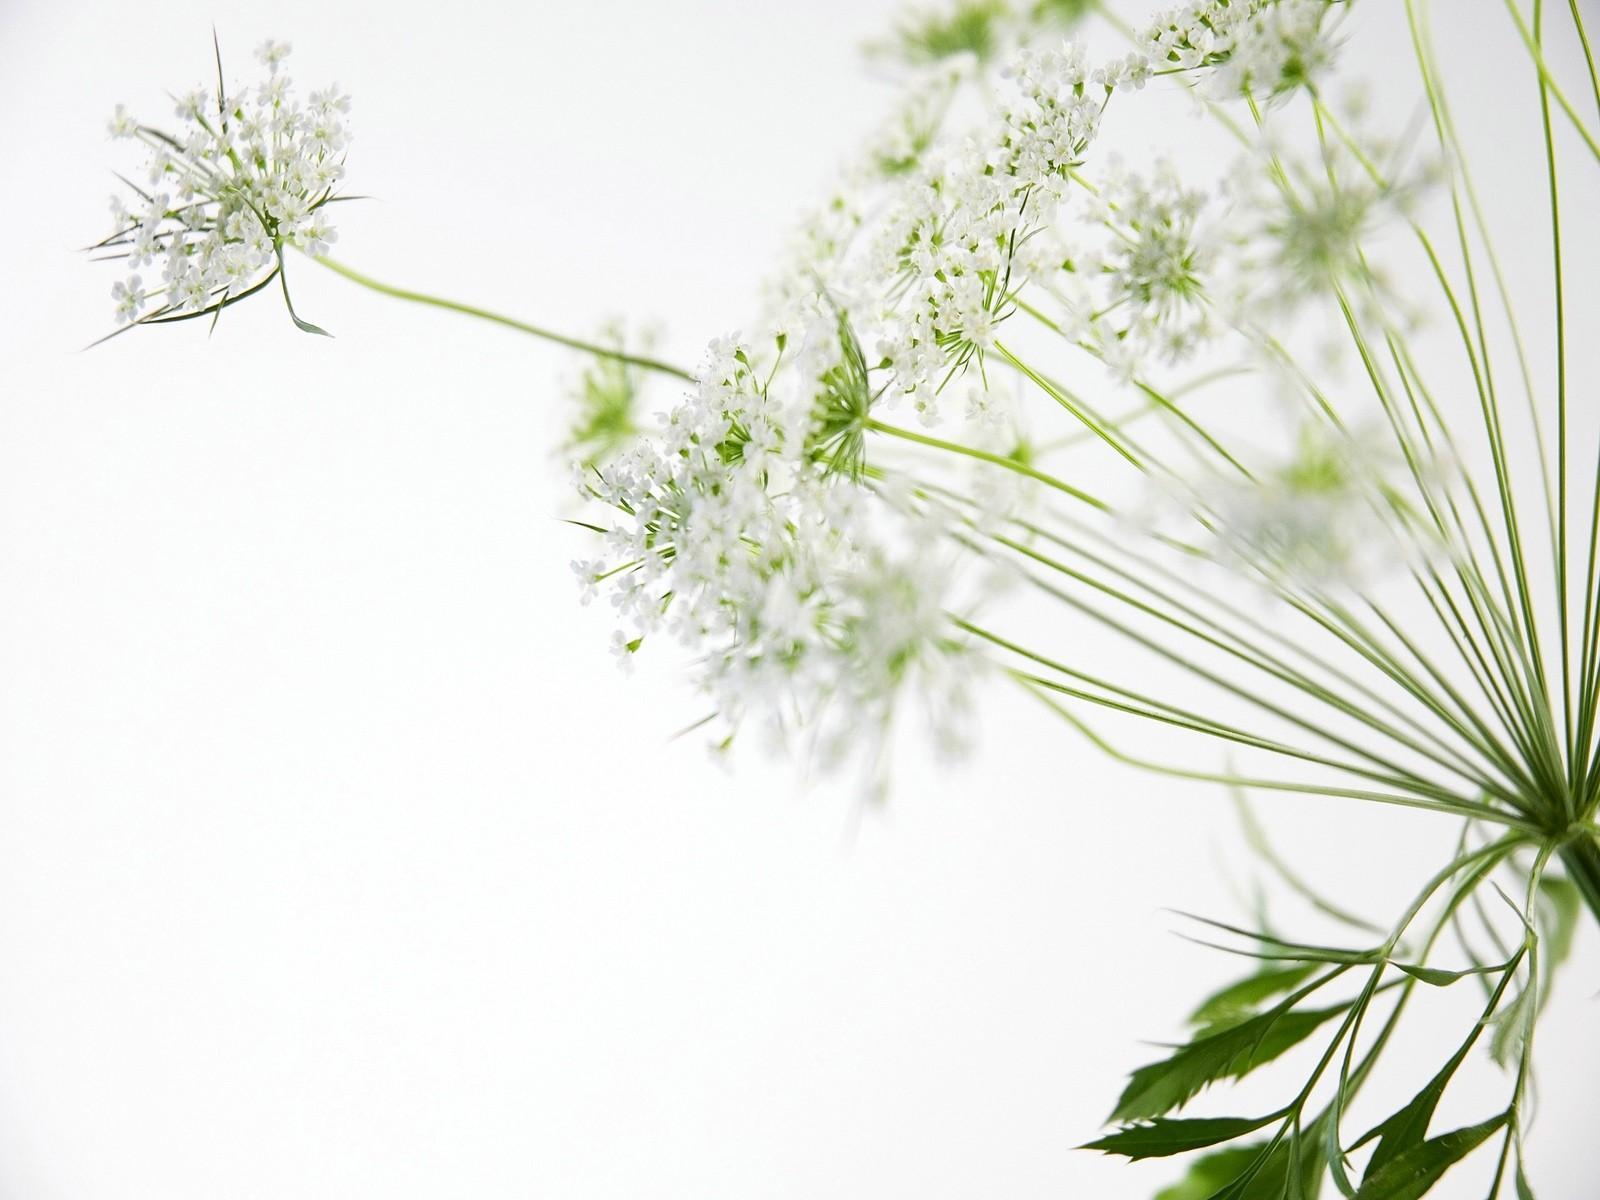 http://3.bp.blogspot.com/-bA3CFwtB4bM/T7CQk_6lg8I/AAAAAAAAAMI/BrthqHHJMX4/s1600/nice_white_flowers_desktop_wallpaper_46787.jpg